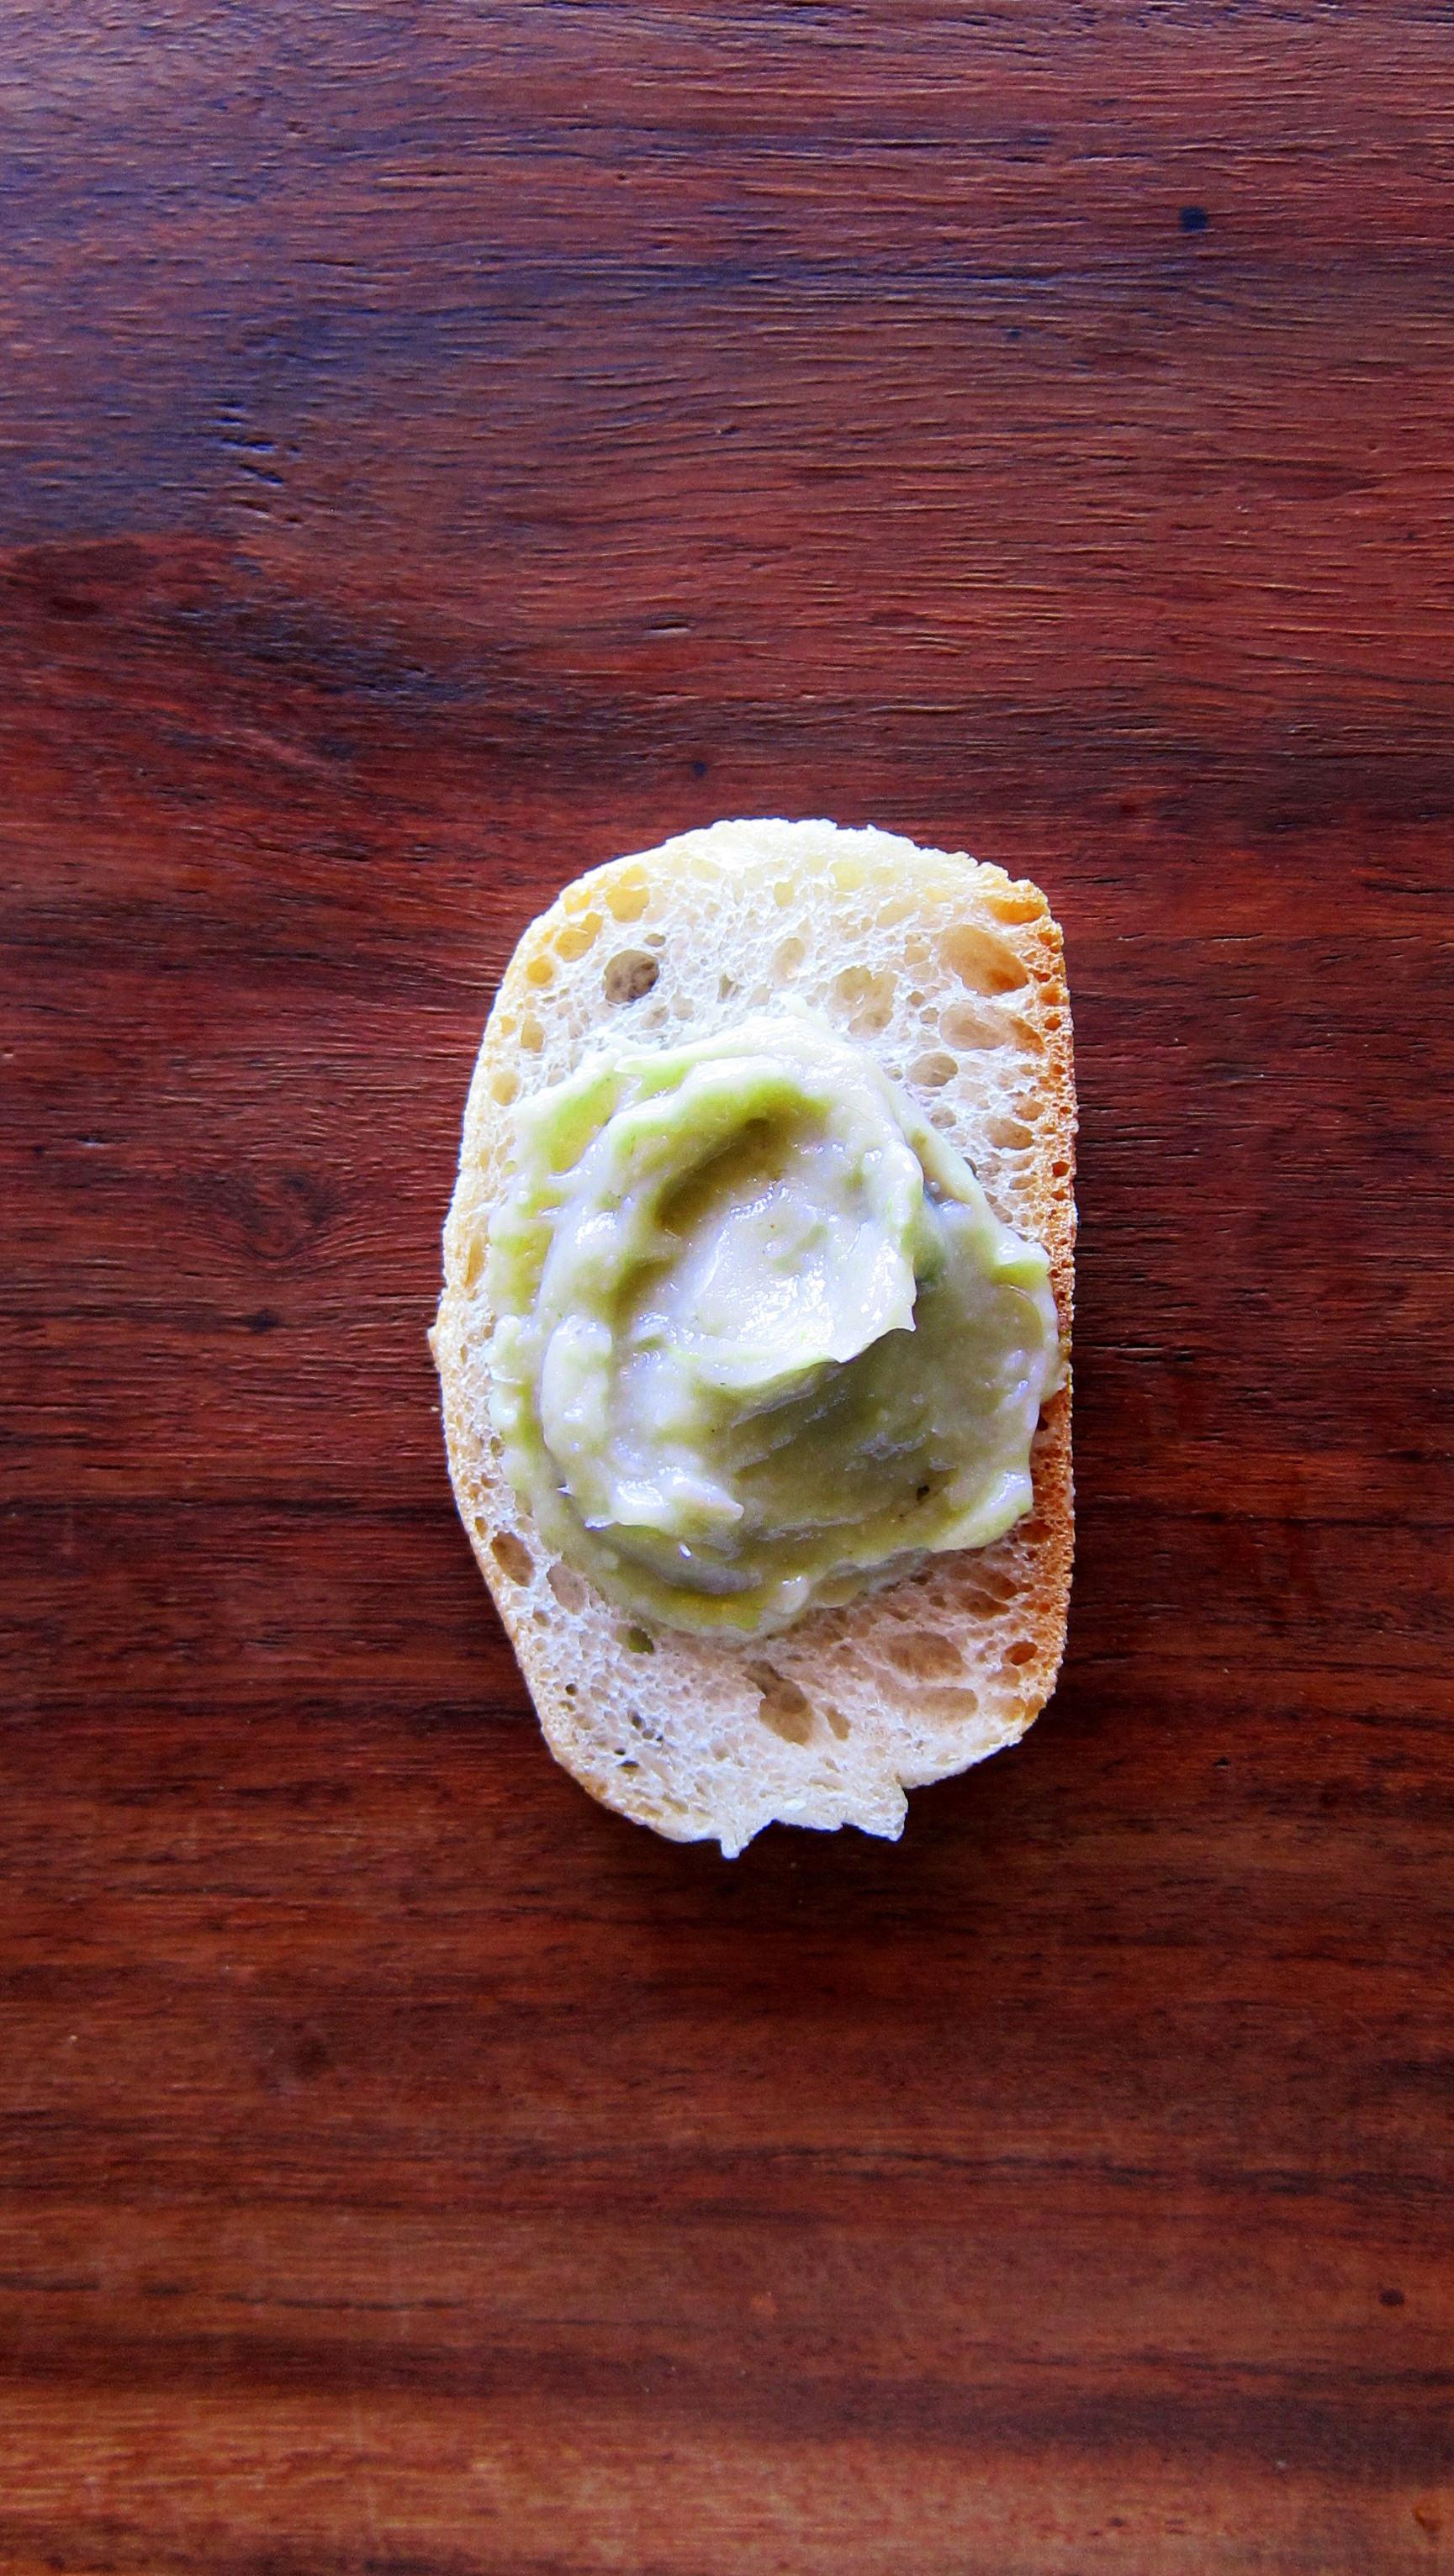 Artichoke and White Bean Dip Pressure Cooker Recipe